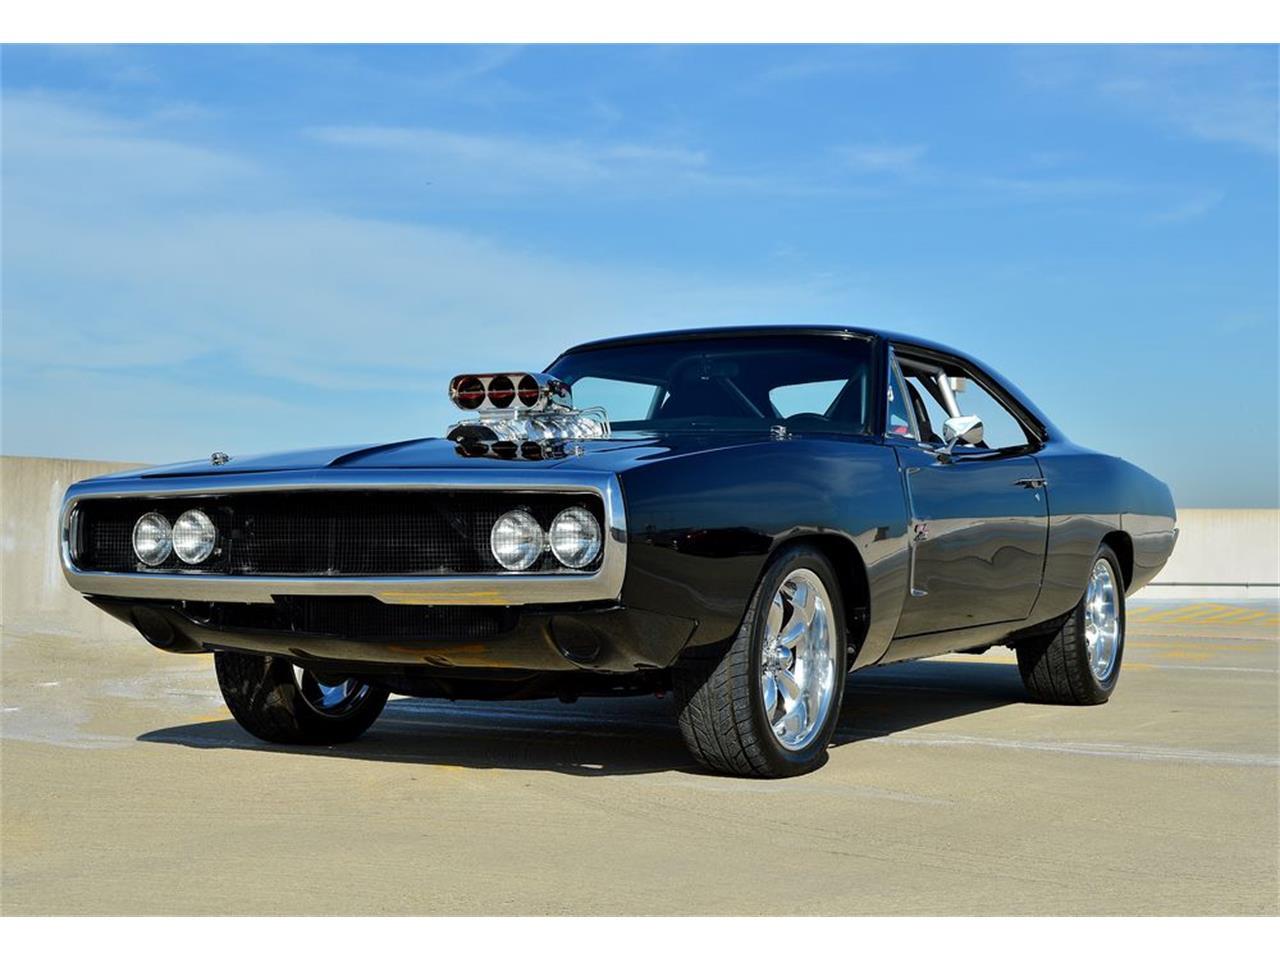 1968 dodge charger fast n furious movie car for sale cc 968915. Black Bedroom Furniture Sets. Home Design Ideas